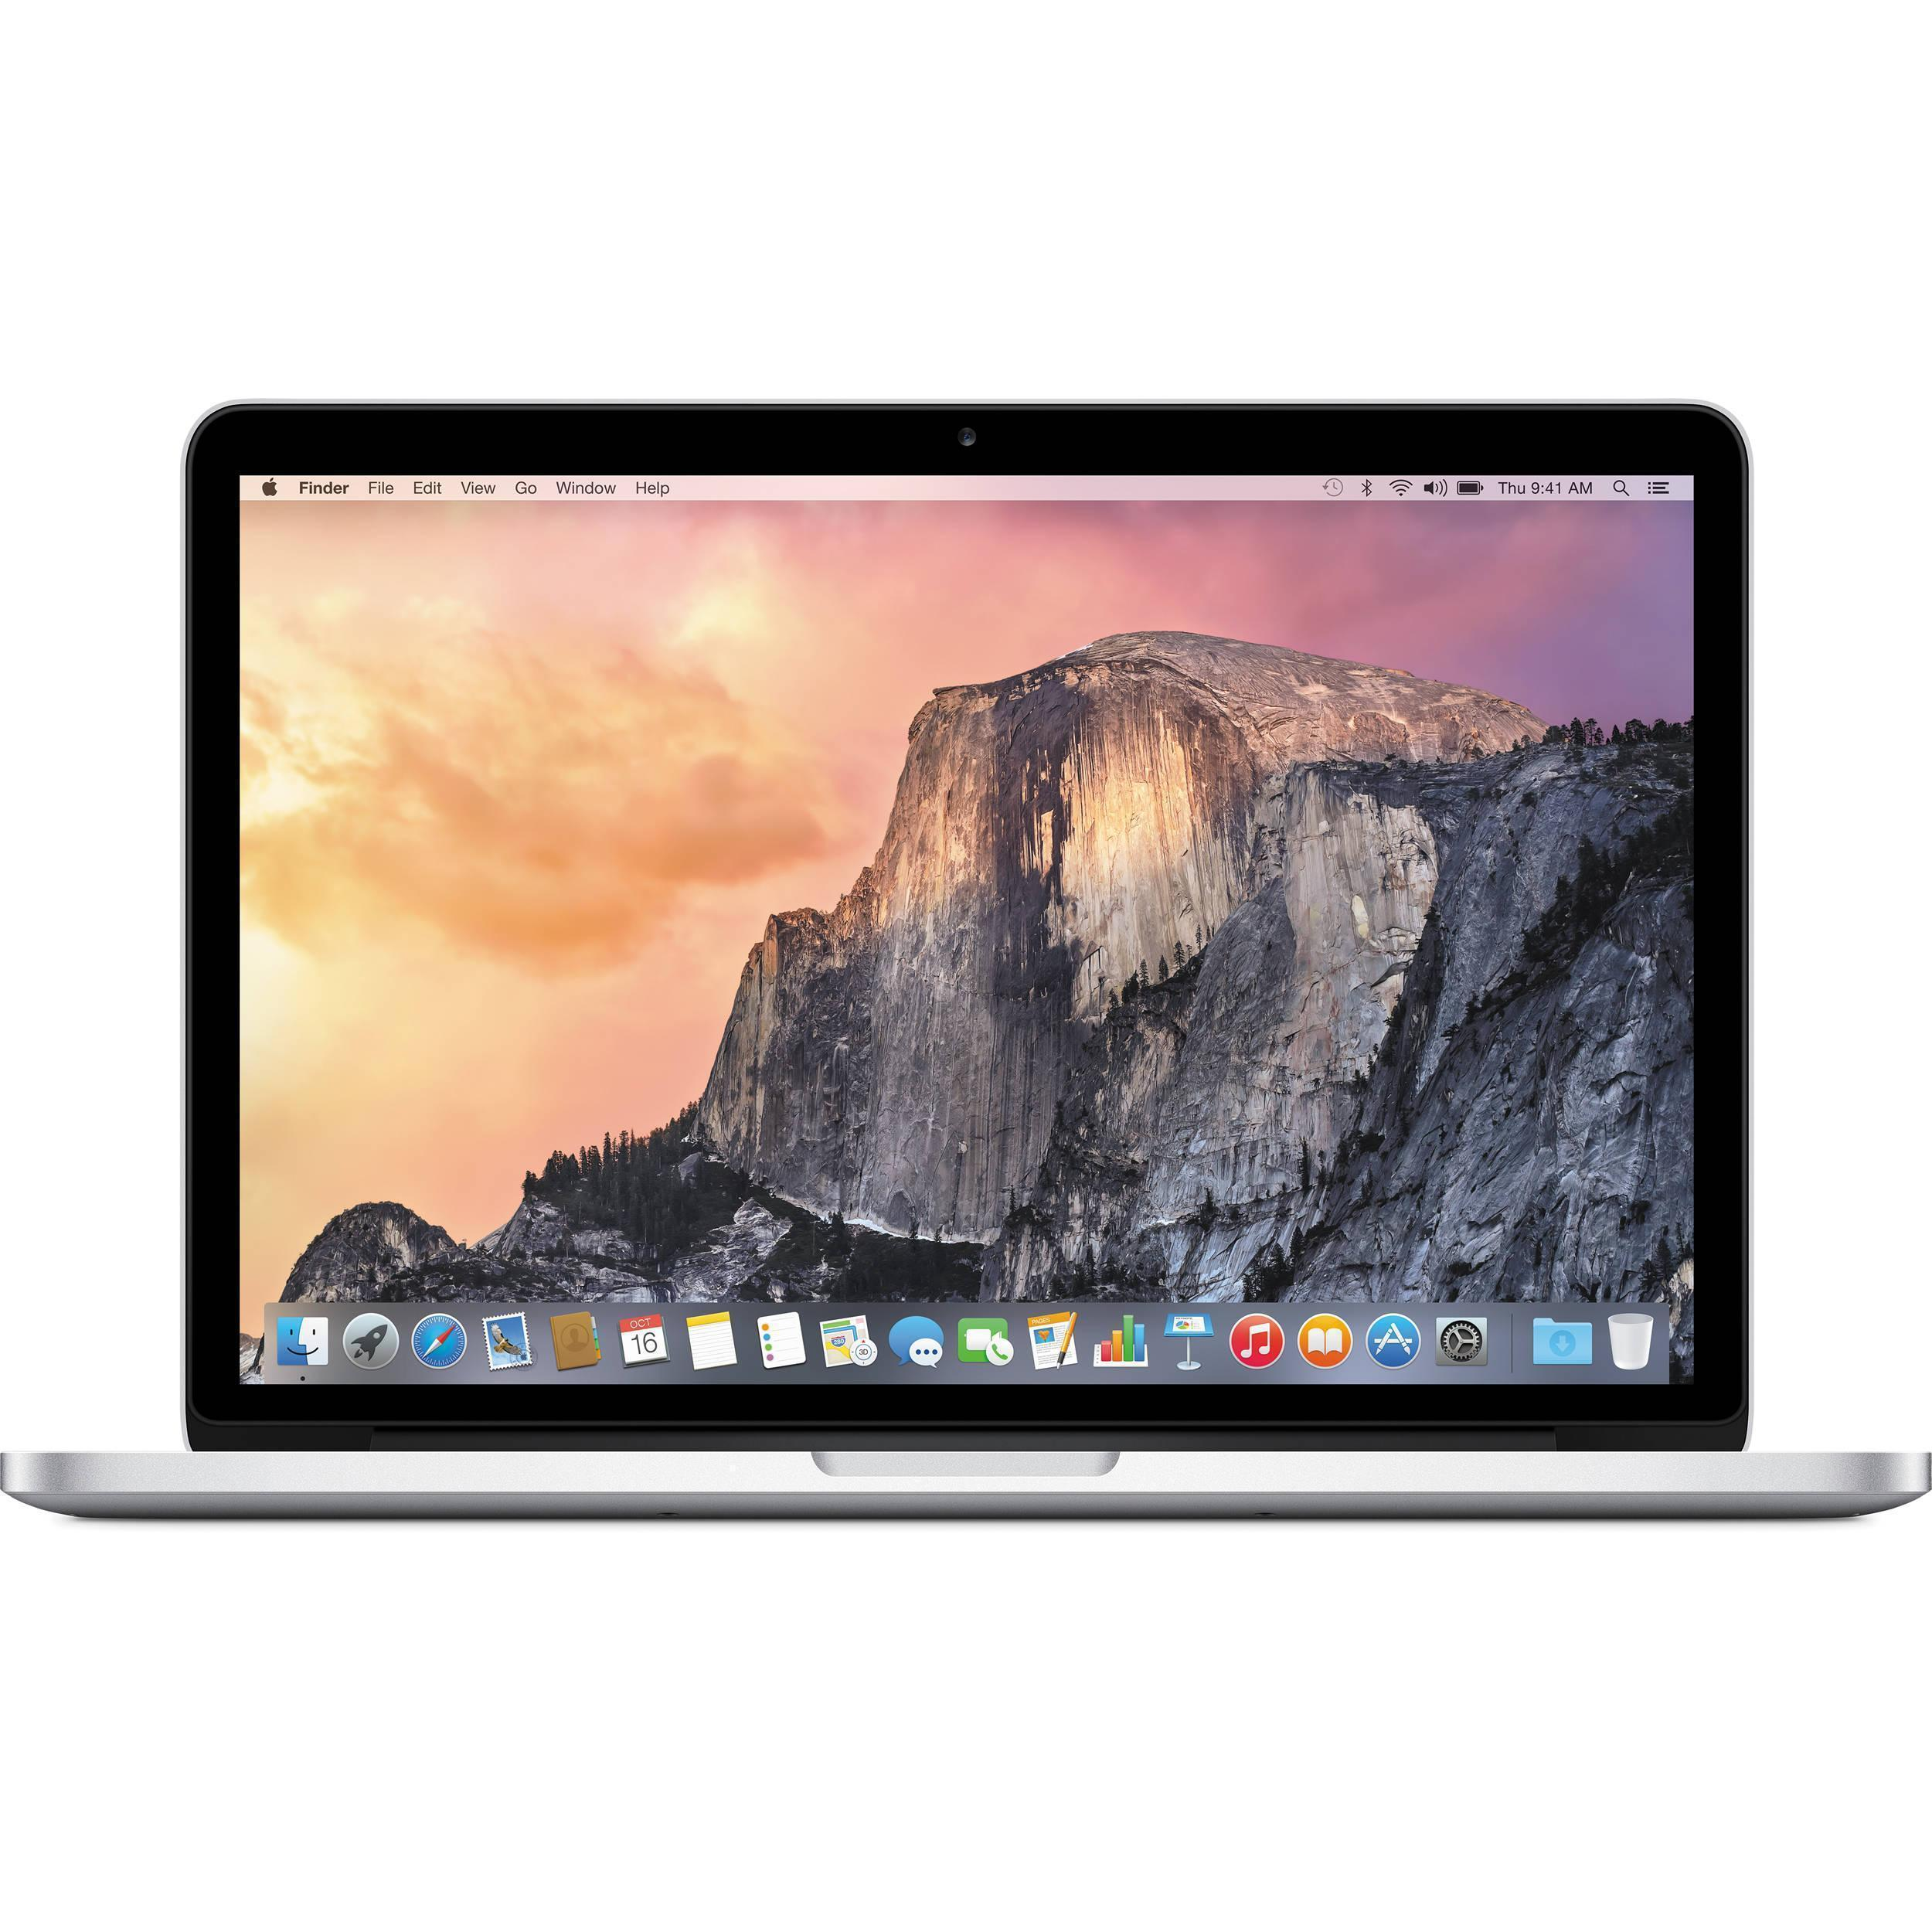 "MacBook Pro 13"" Retina (2012) - Core i5 2,5 GHz - HDD 1 TB - 8GB - AZERTY - Französisch"